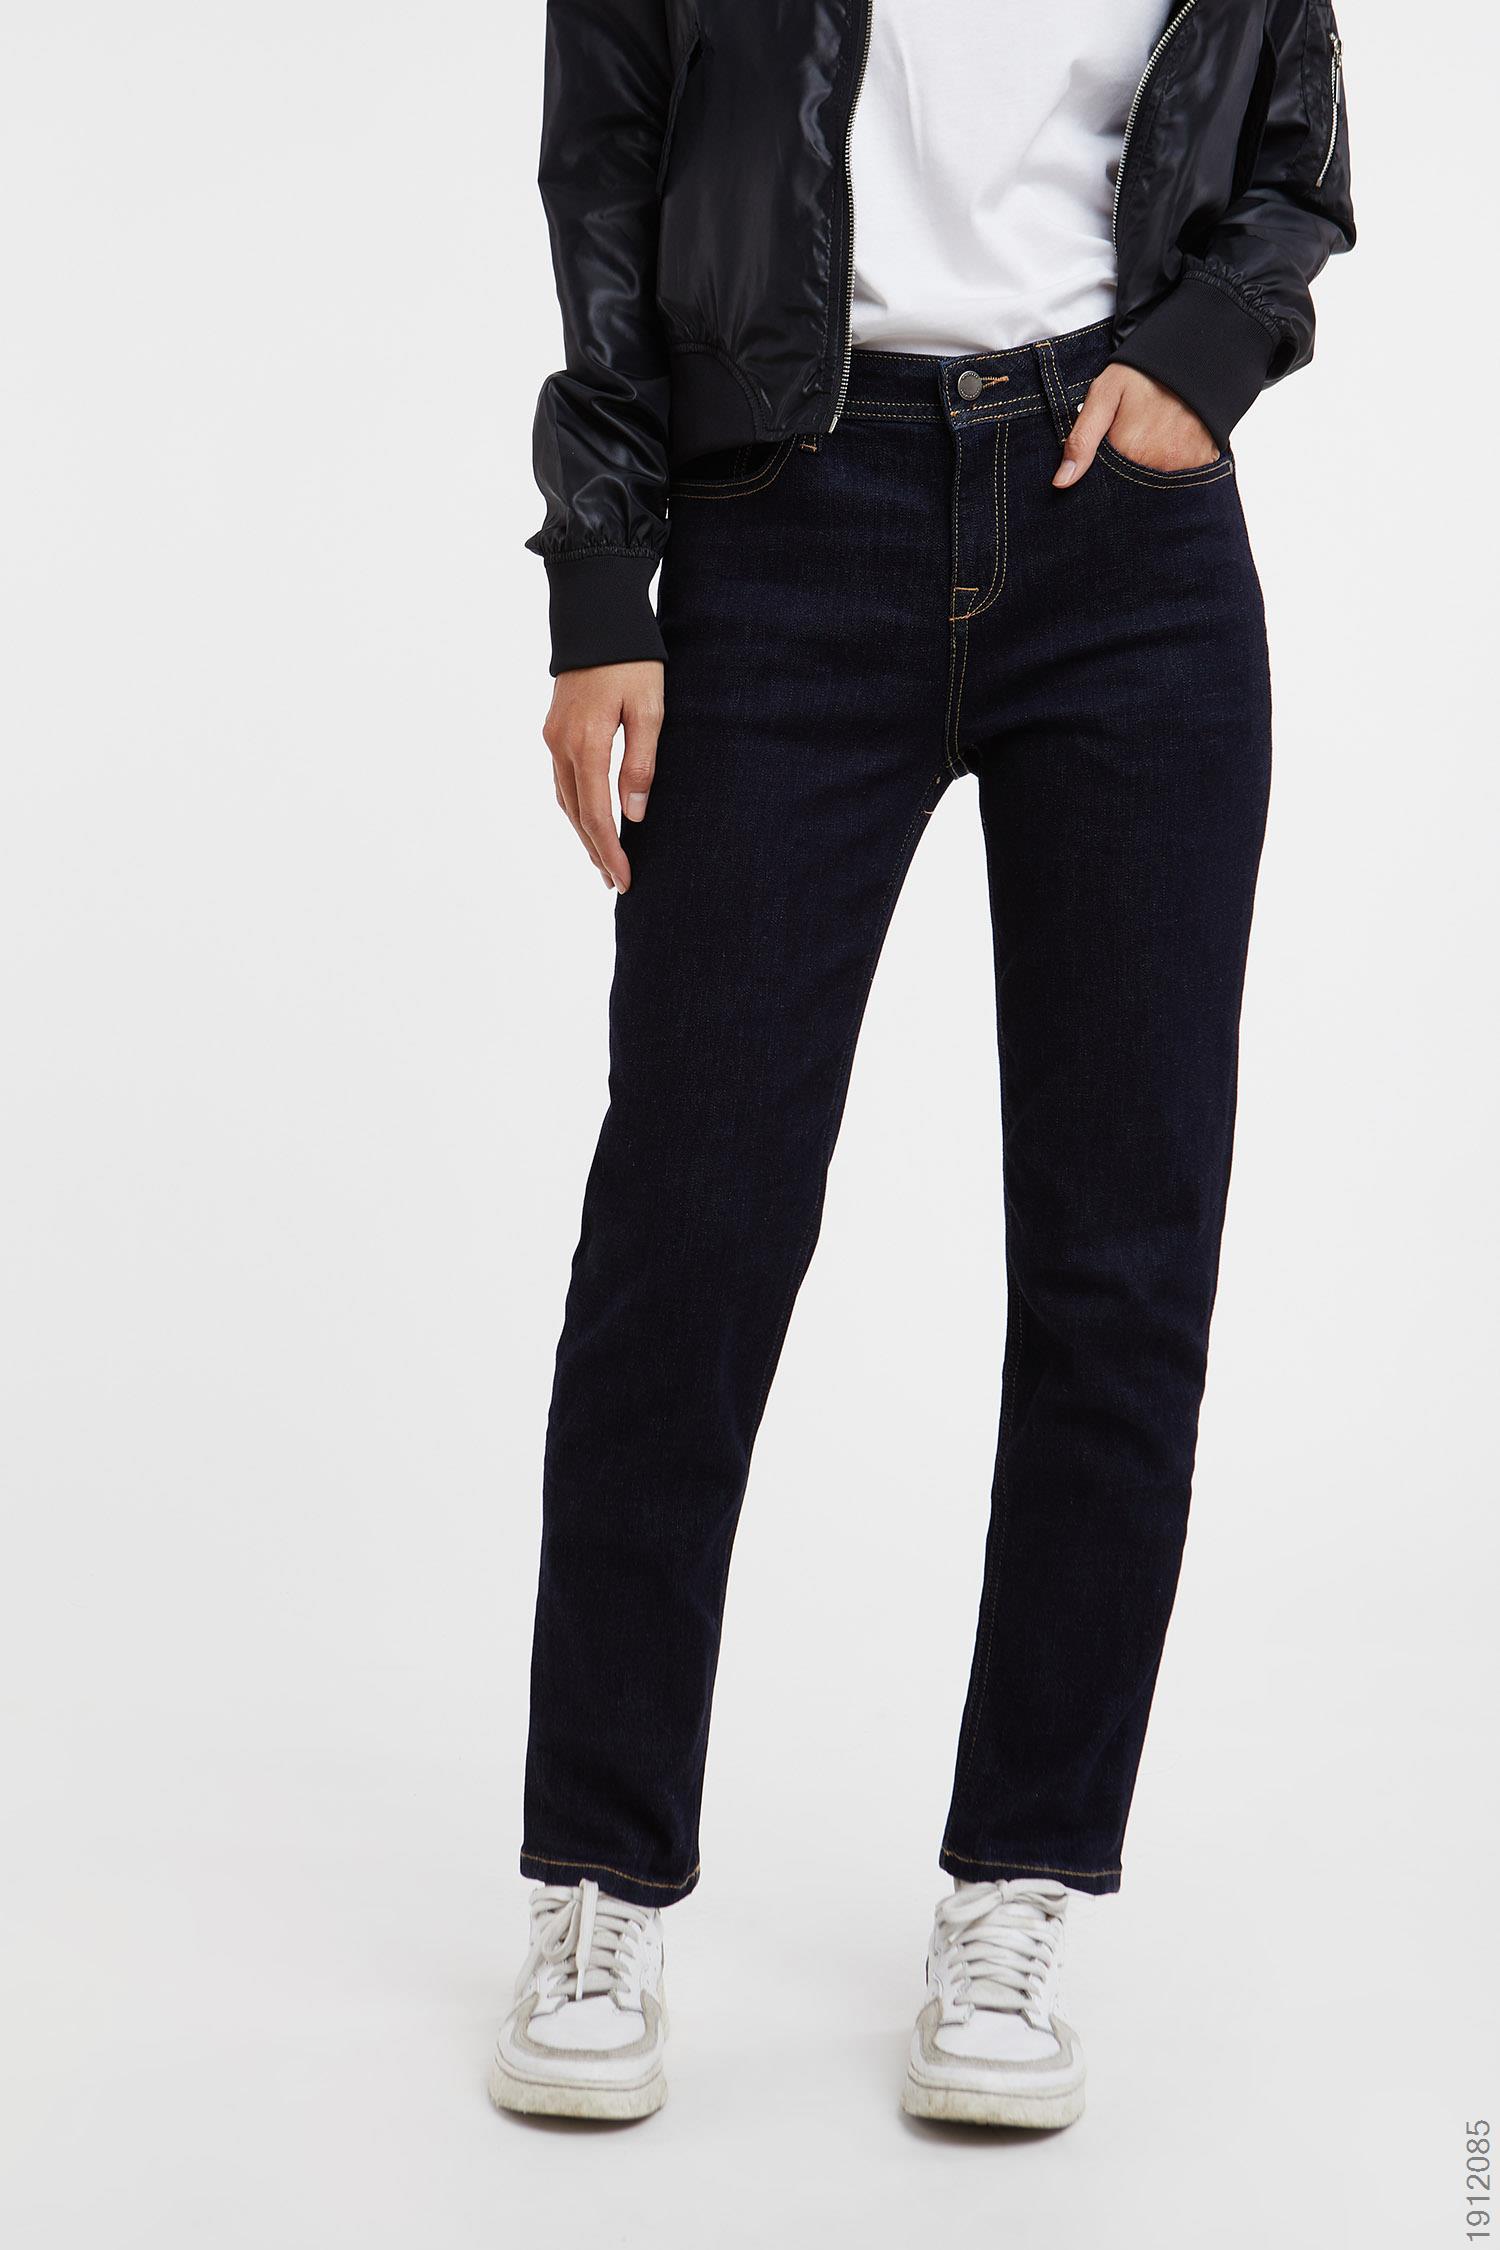 quần jean nữ - 1912085